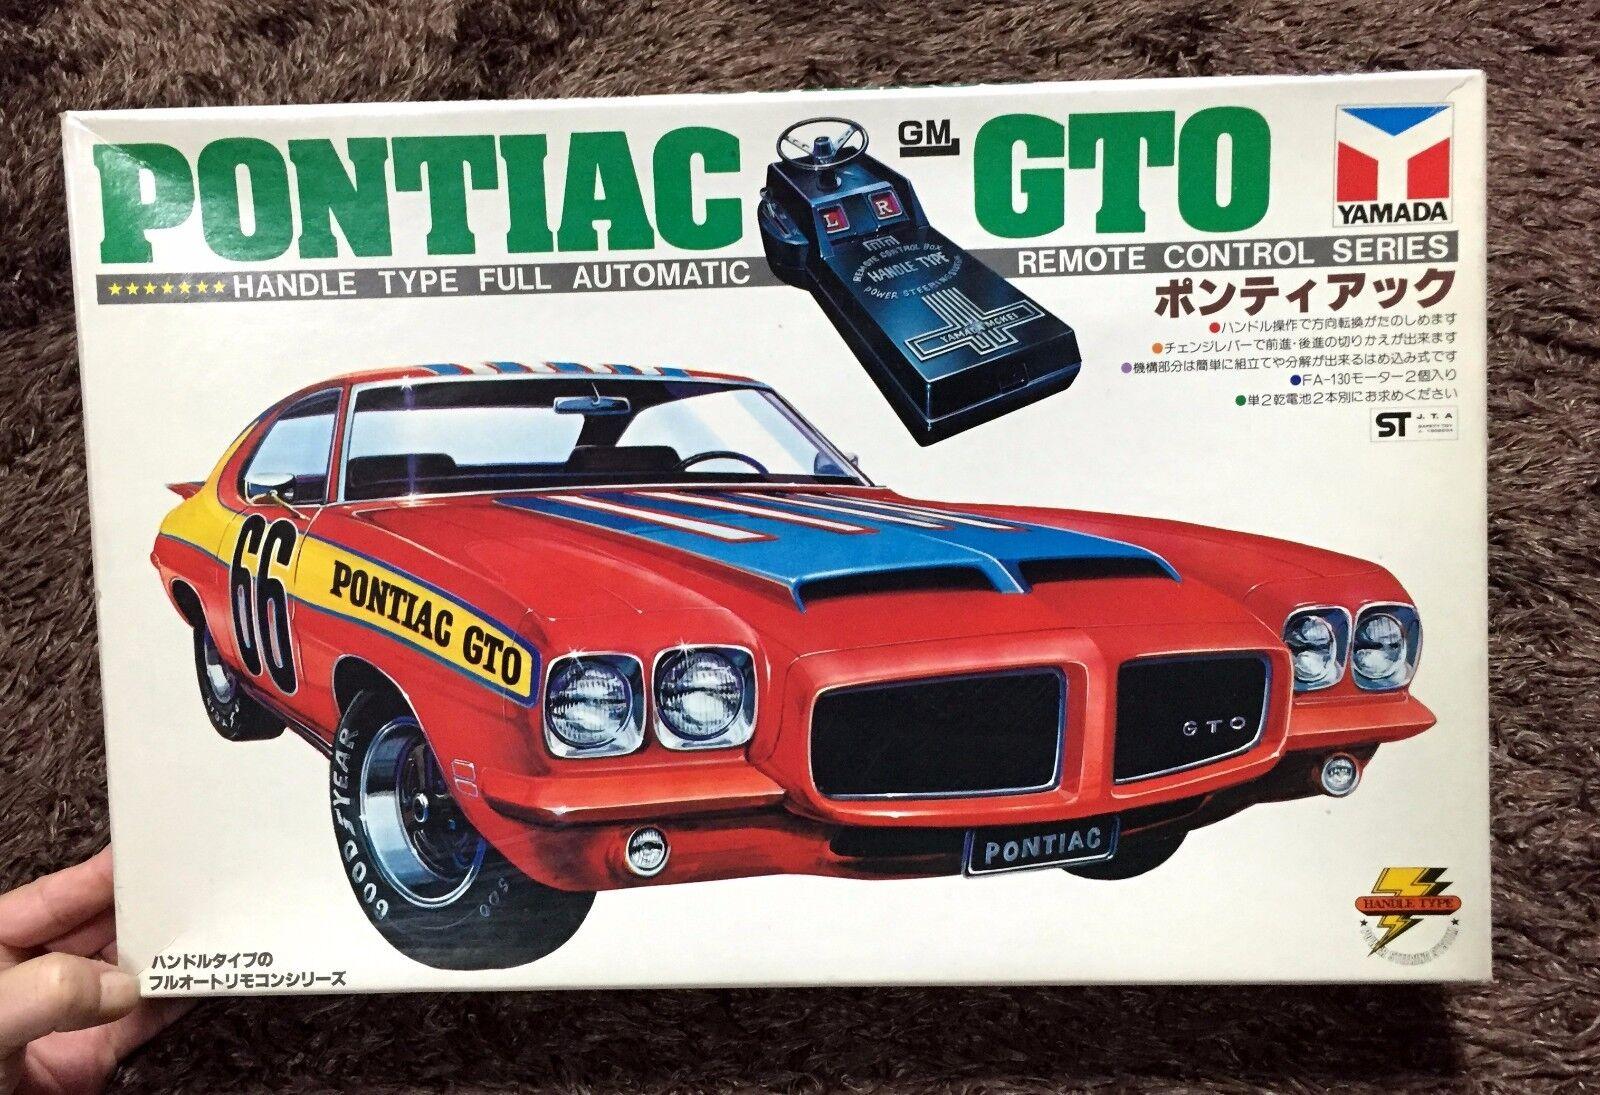 GM PONTIAC GTO  REMOTE CONTROL  MODEL KIT YAMADA JAPAN